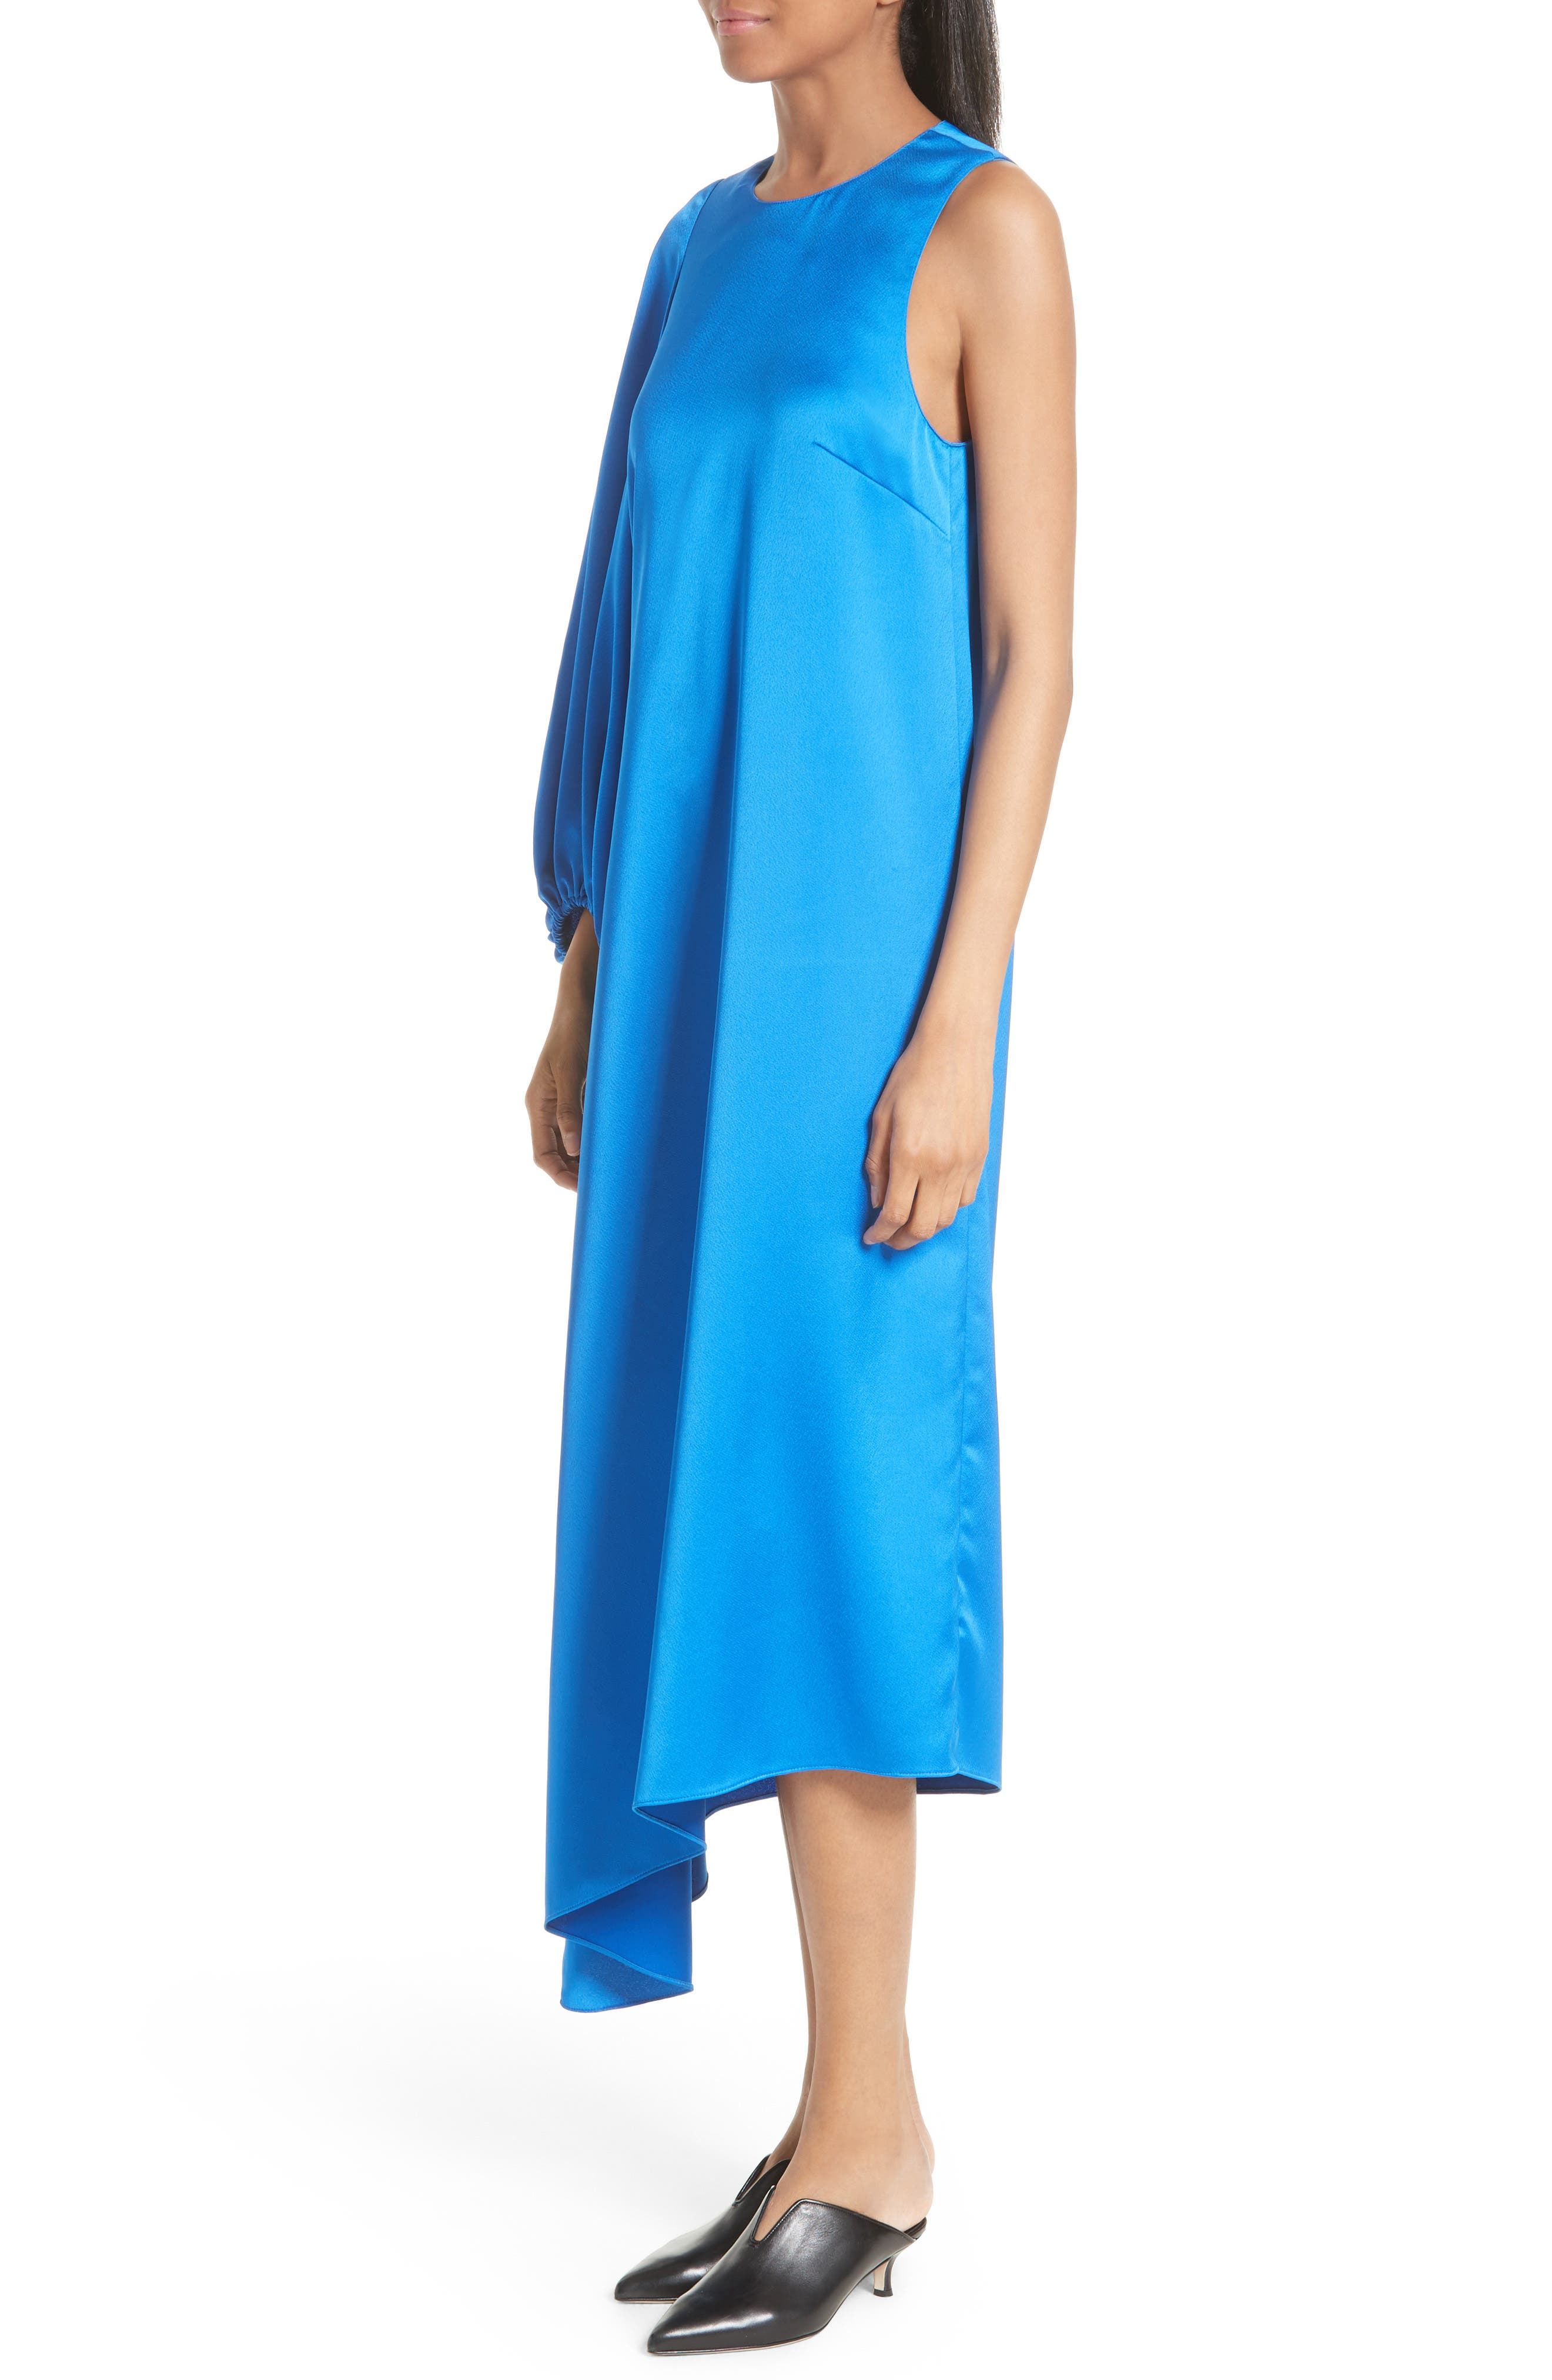 Celestia One Sleeve Bias Cut Satin Dress,                             Alternate thumbnail 3, color,                             408